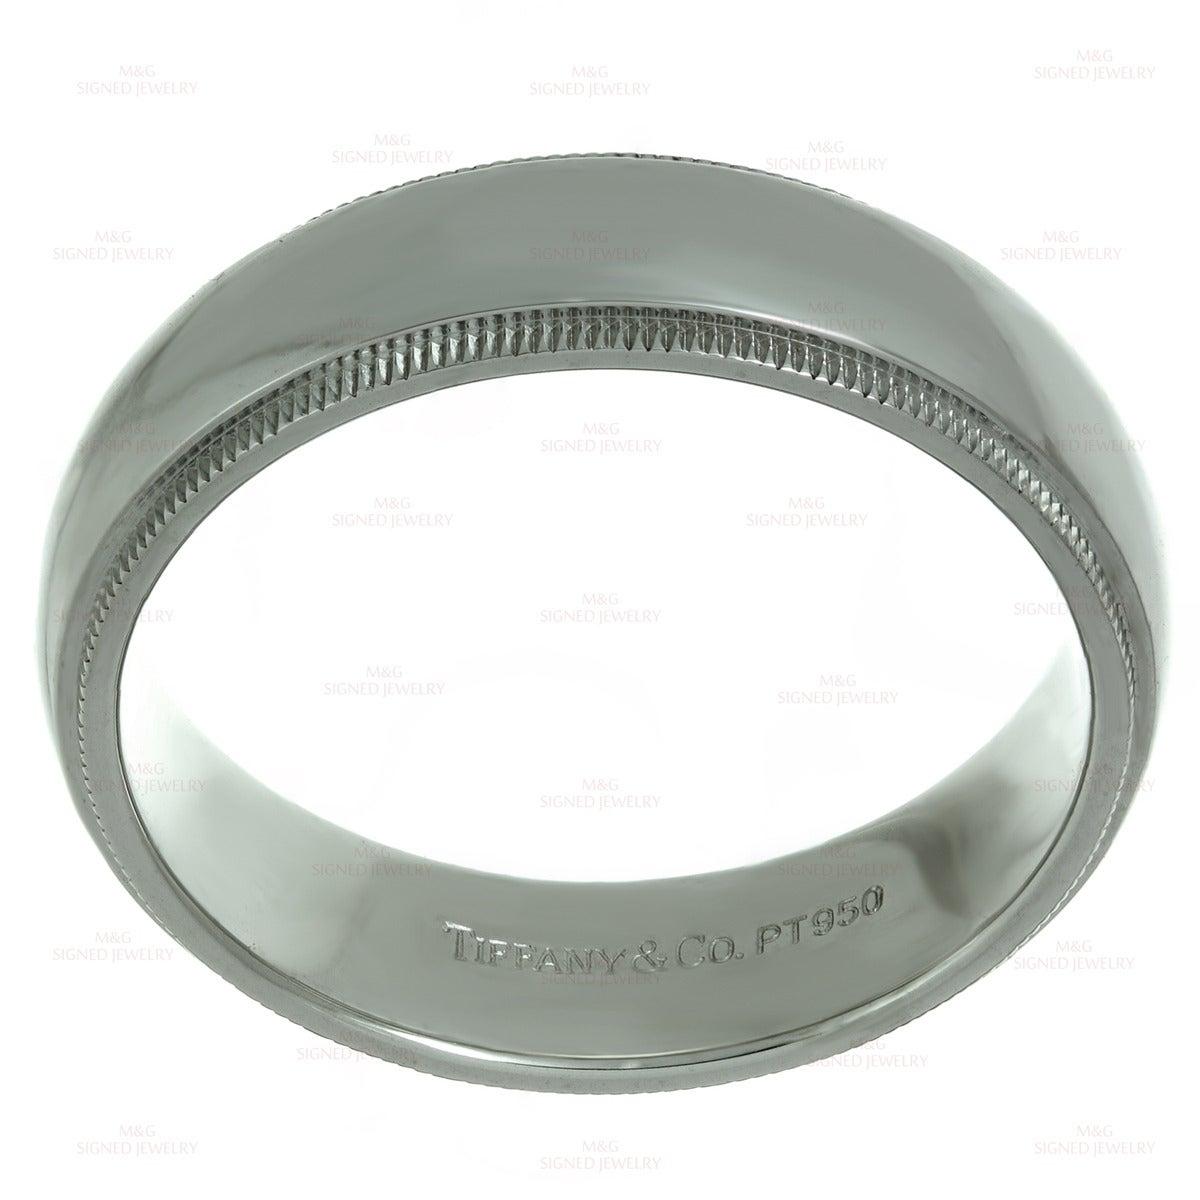 Platinum Double Milgrain 6mm Wide Flat Wedding Band Ring: TIFFANY And CO. Classic Double Milgrain Platinum Wedding